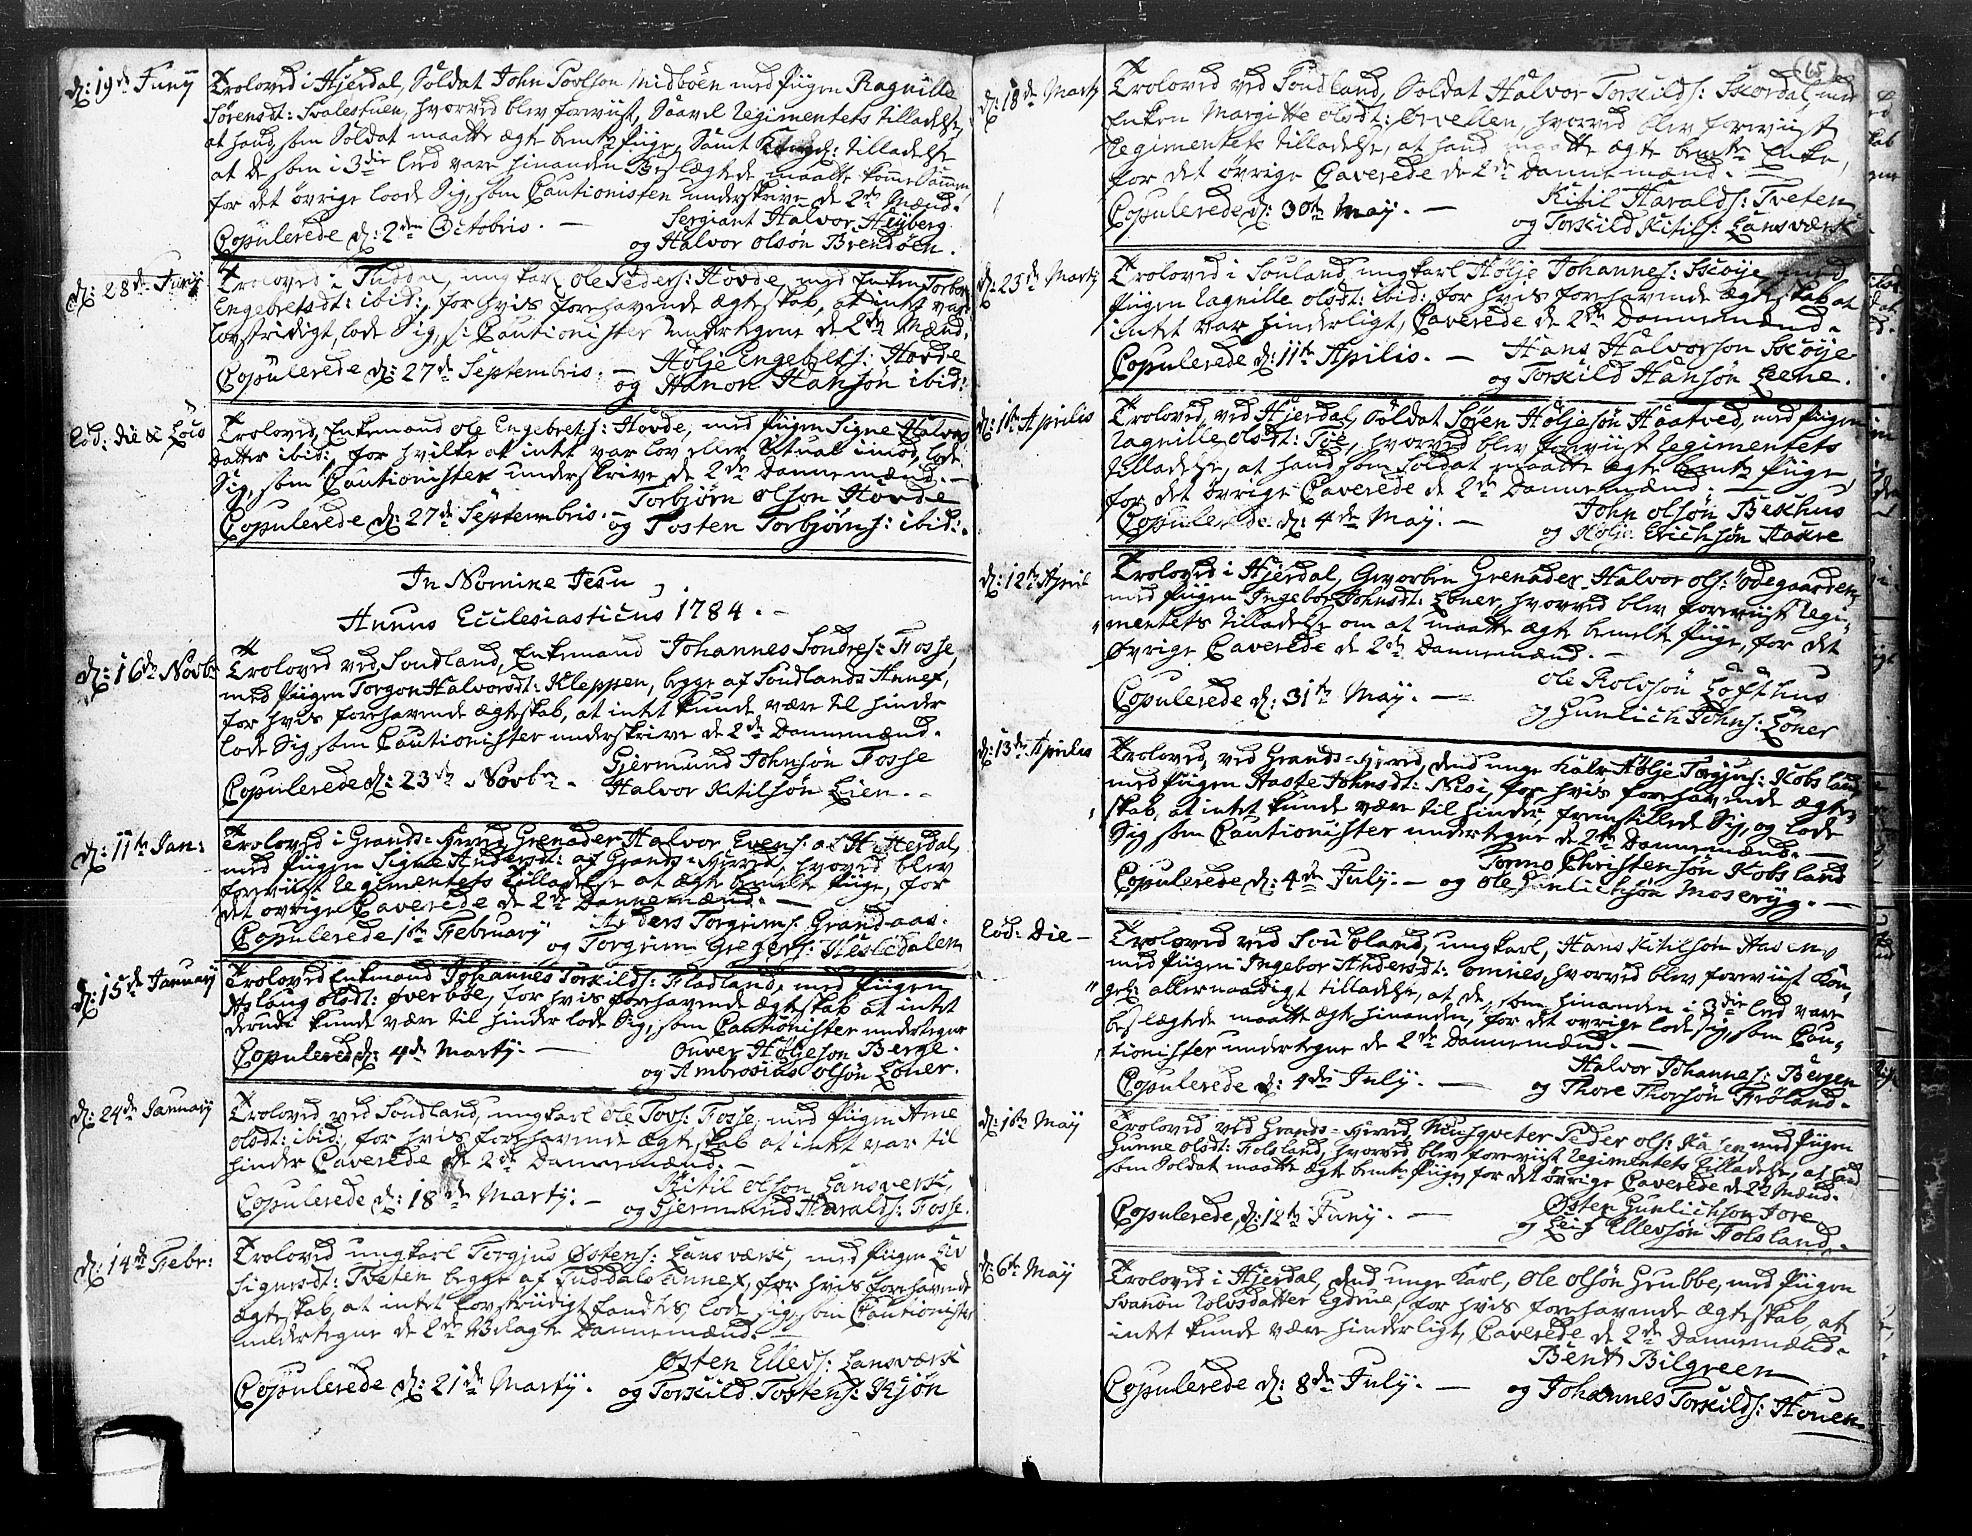 SAKO, Hjartdal kirkebøker, F/Fa/L0004: Ministerialbok nr. I 4, 1727-1795, s. 65